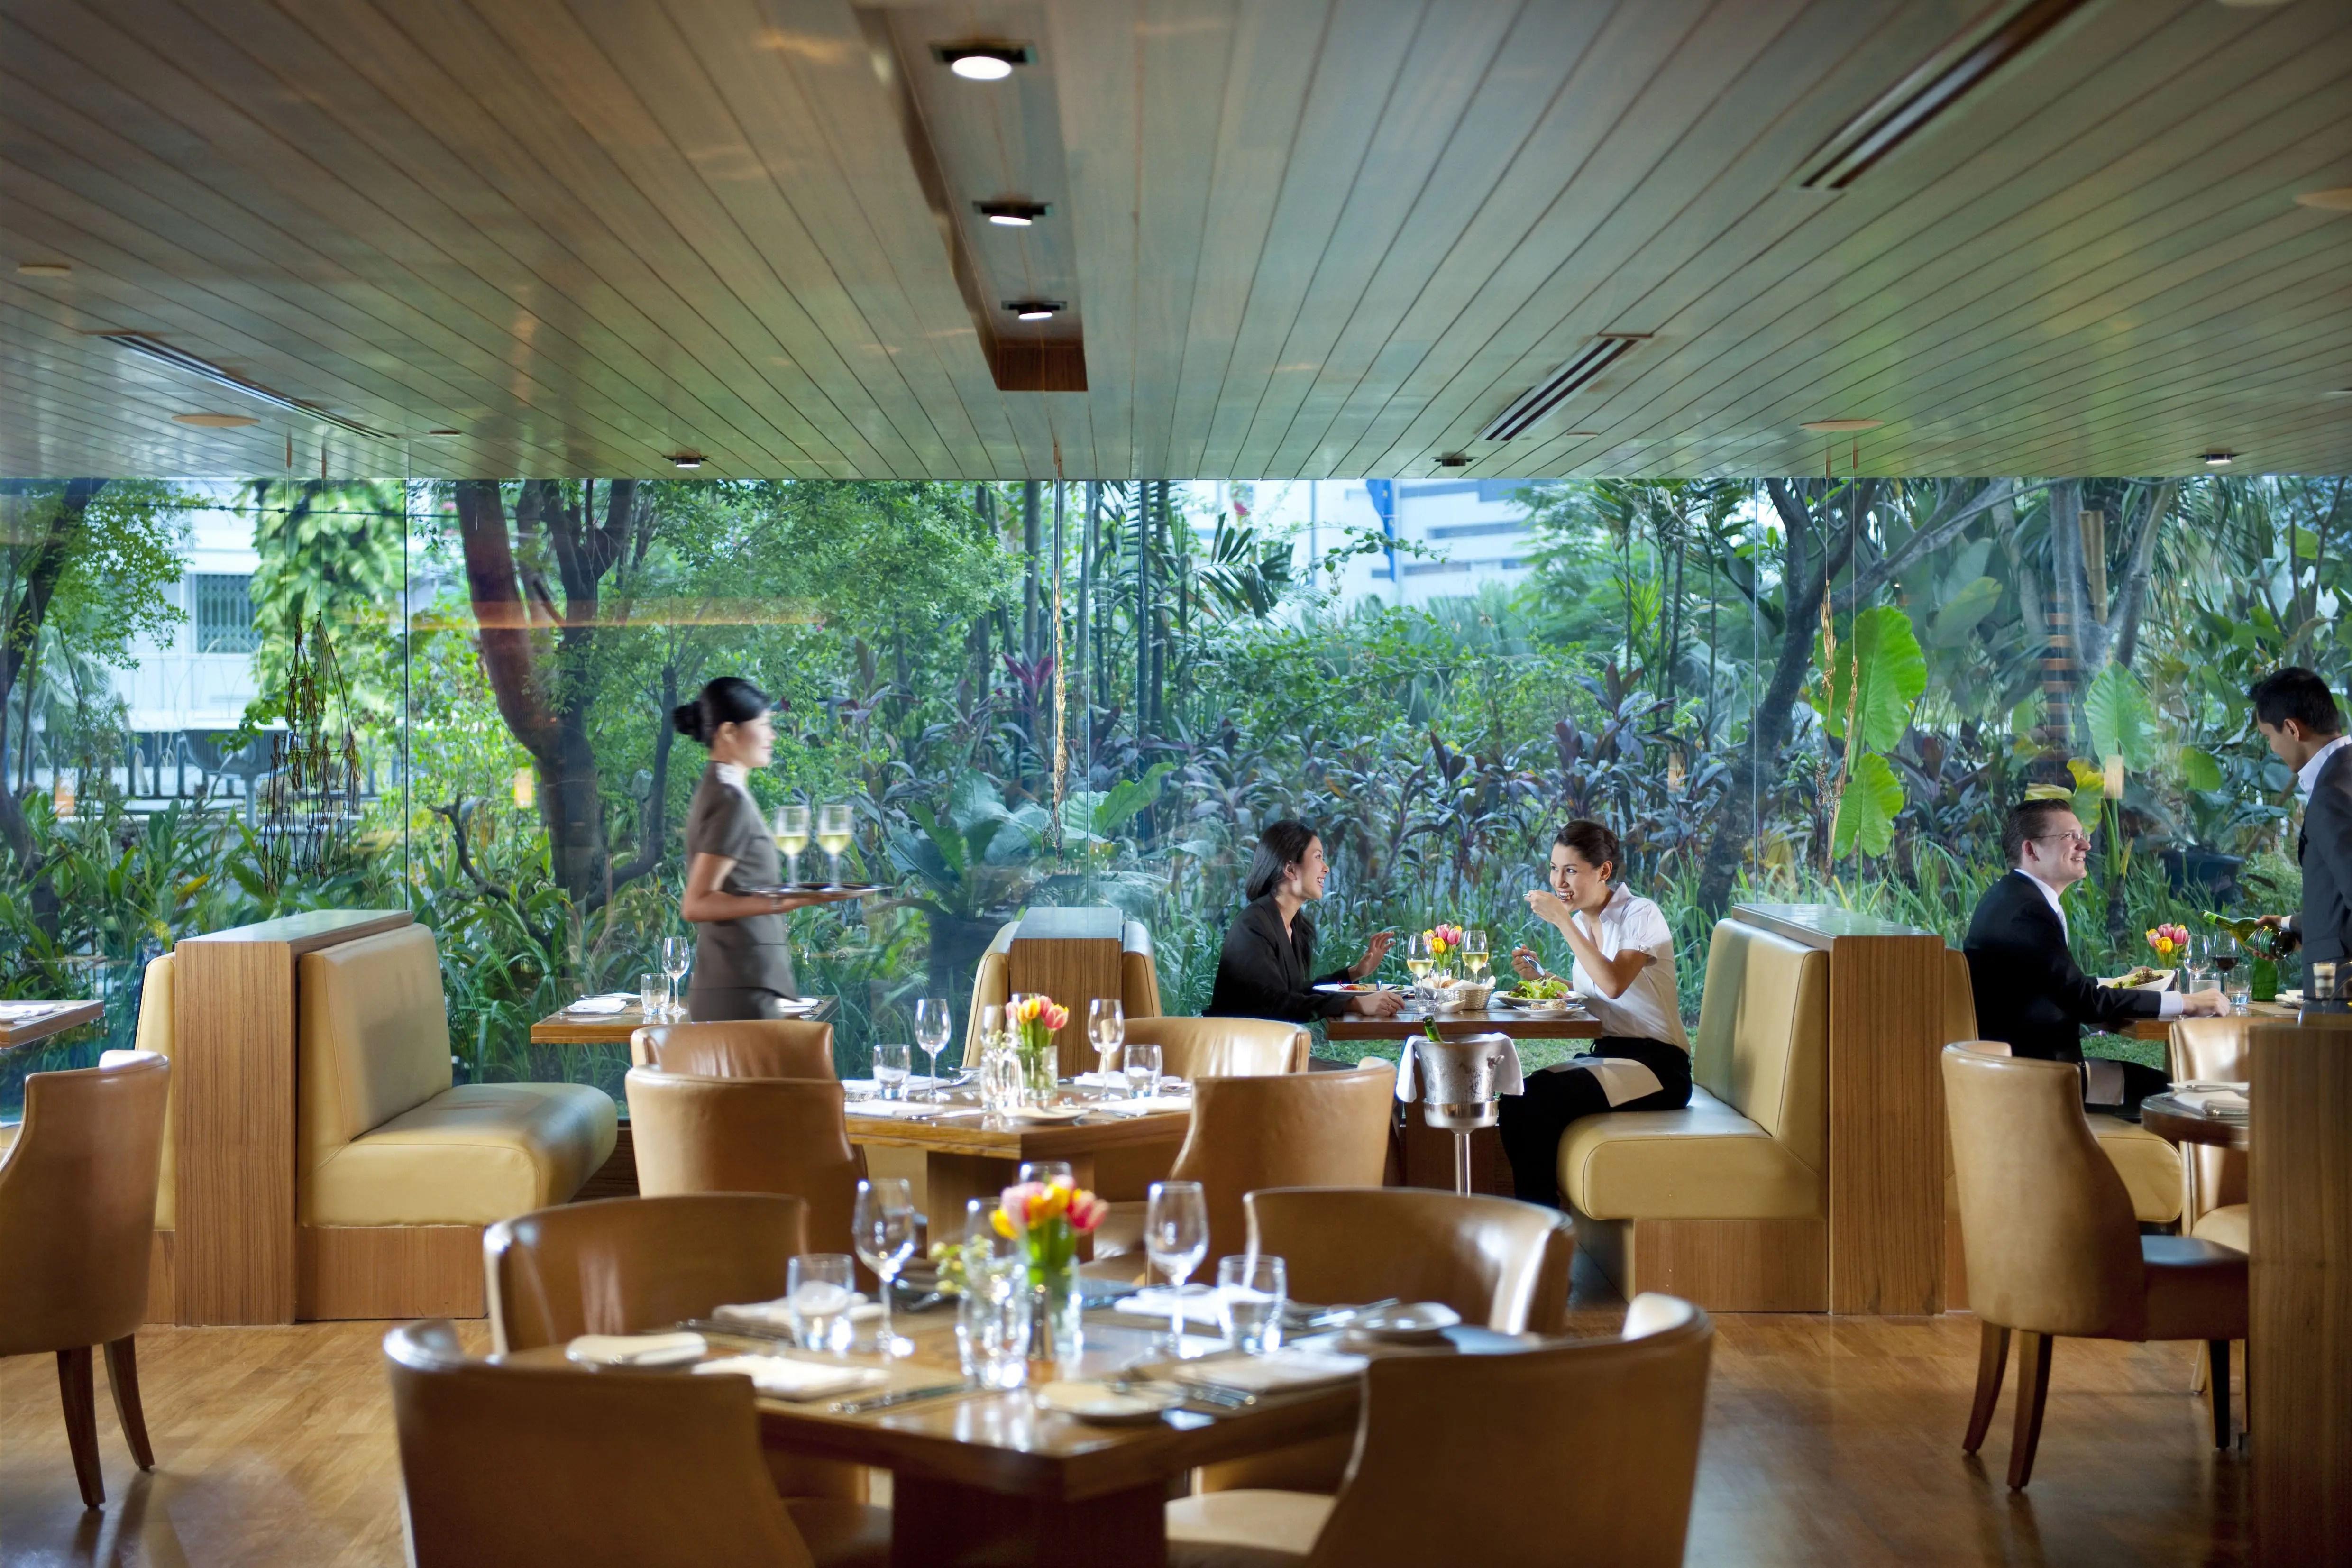 _MG_6793 Bali Cafe